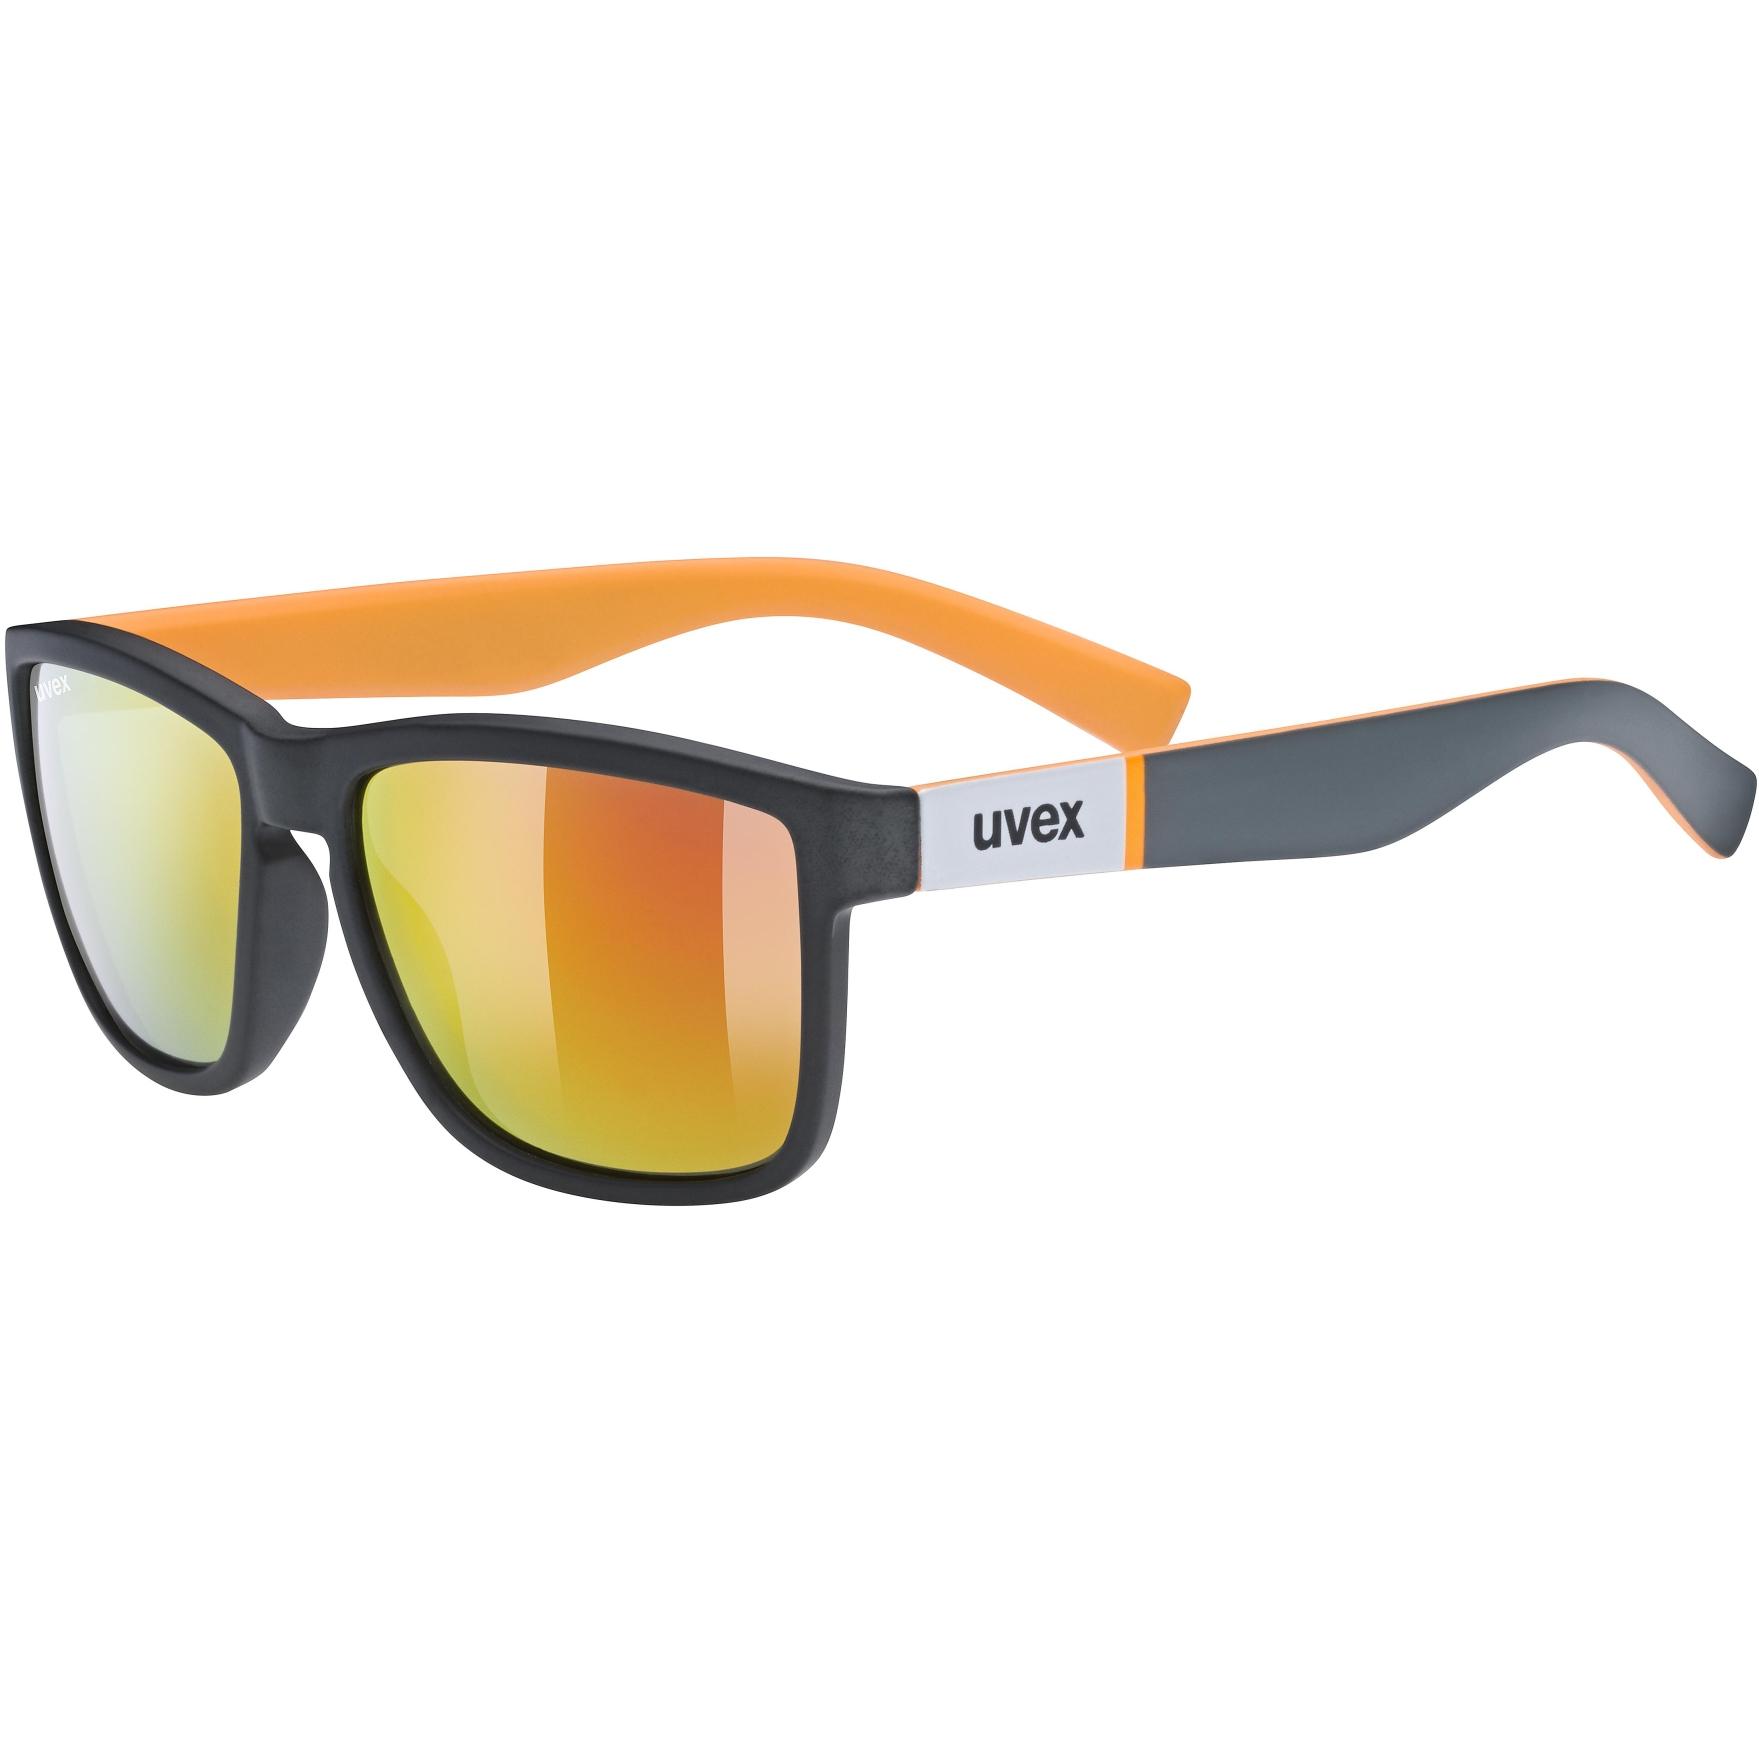 Uvex lgl 39 Glasses - grey mat orange/mirror red